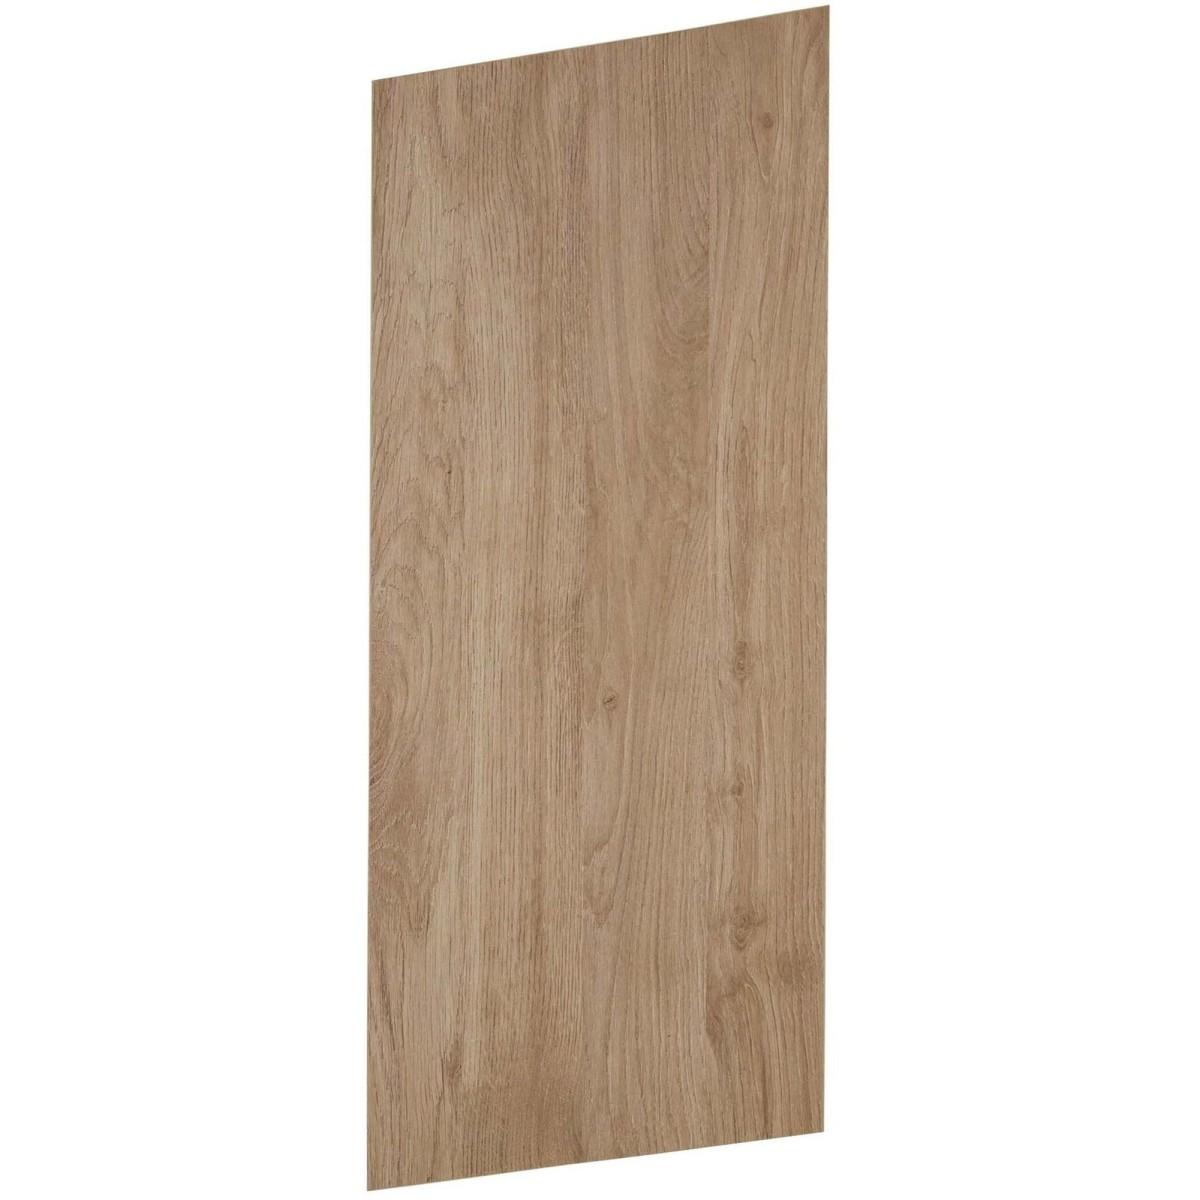 Дверь для шкафа Delinia ID &#34Сантьяго&#34 76.5х29.7 см ЛДСП цвет серый